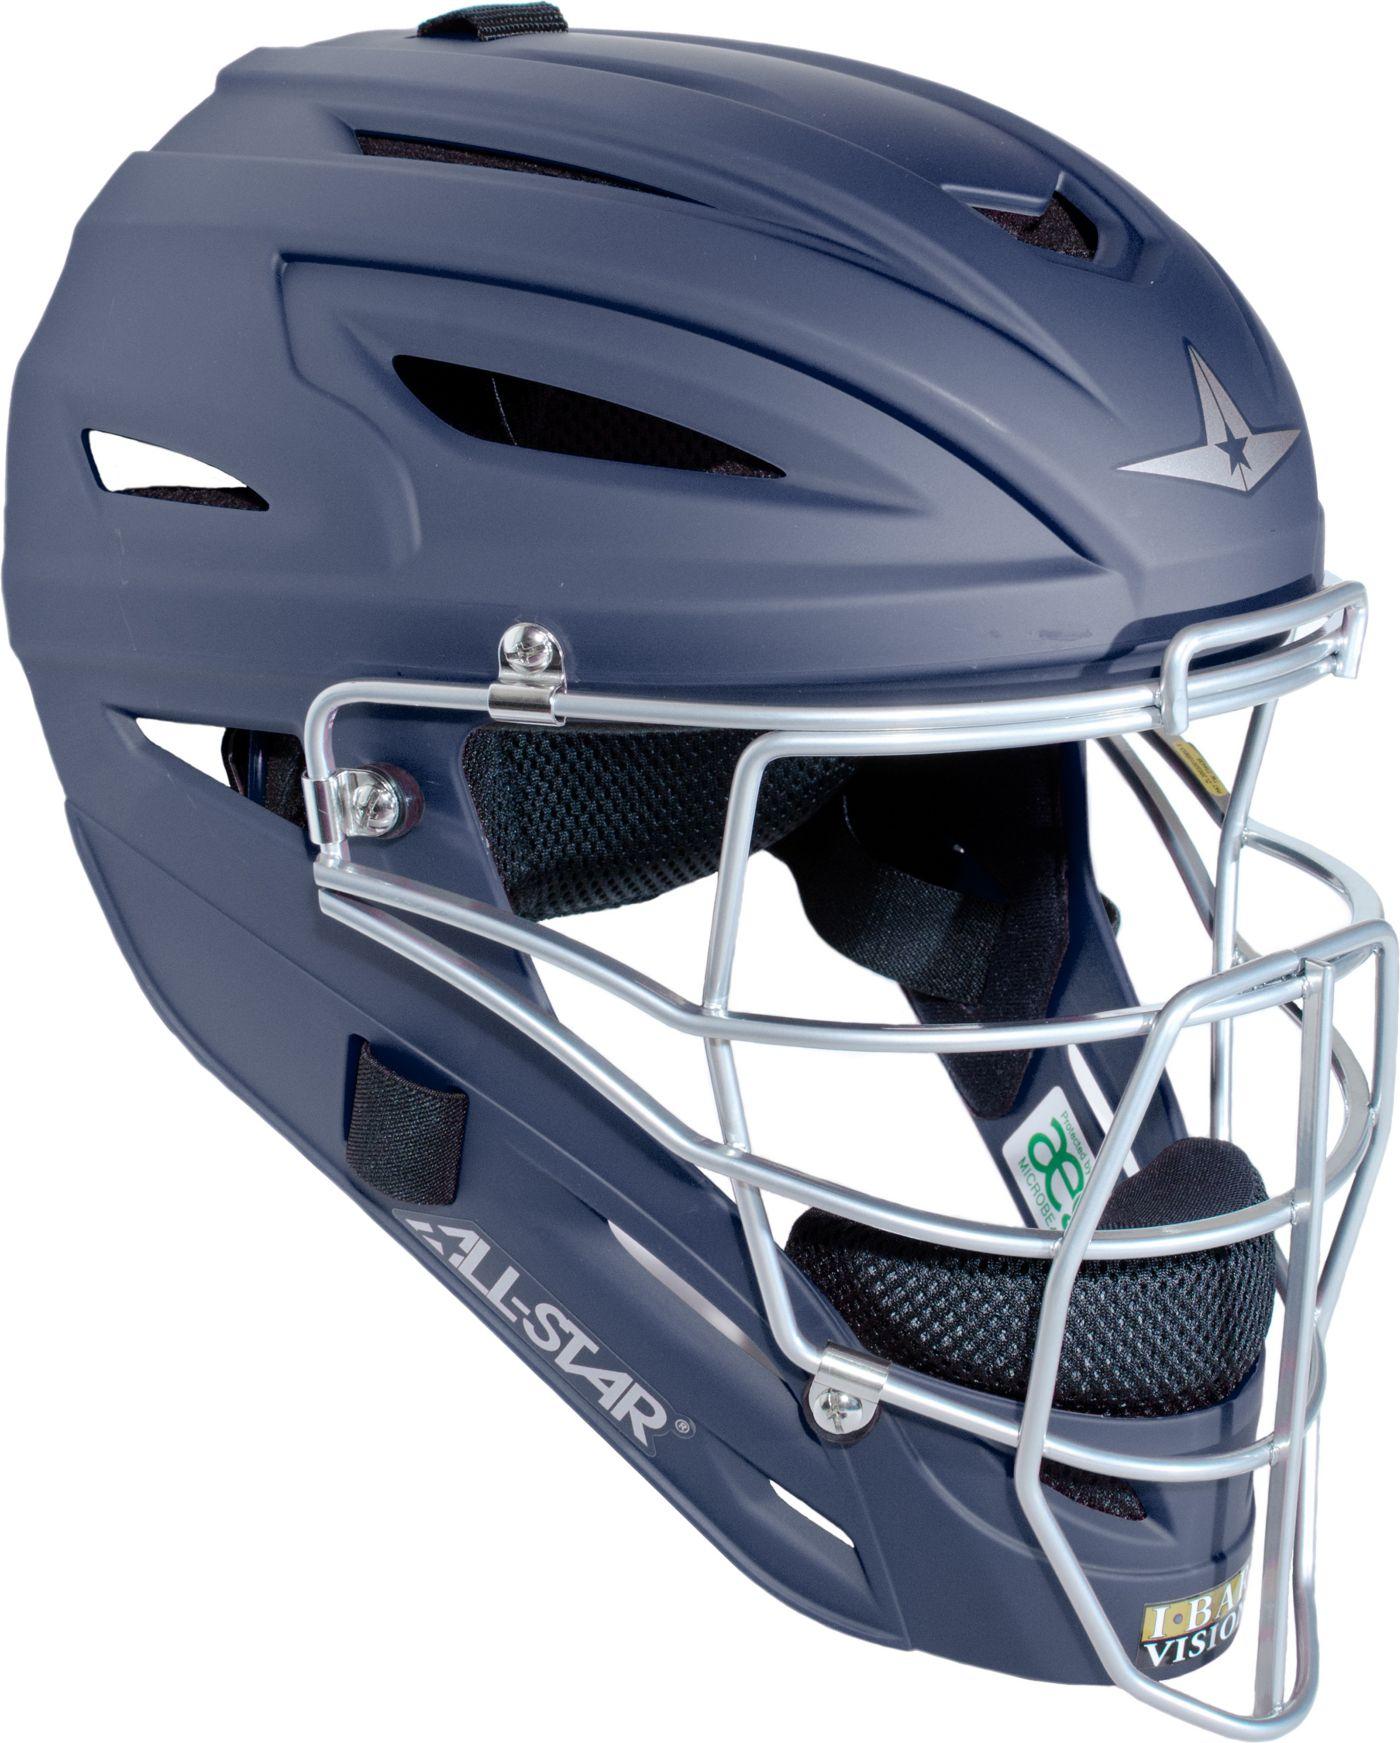 All-Star Youth S7 MVP2510 Series Catcher's Helmet